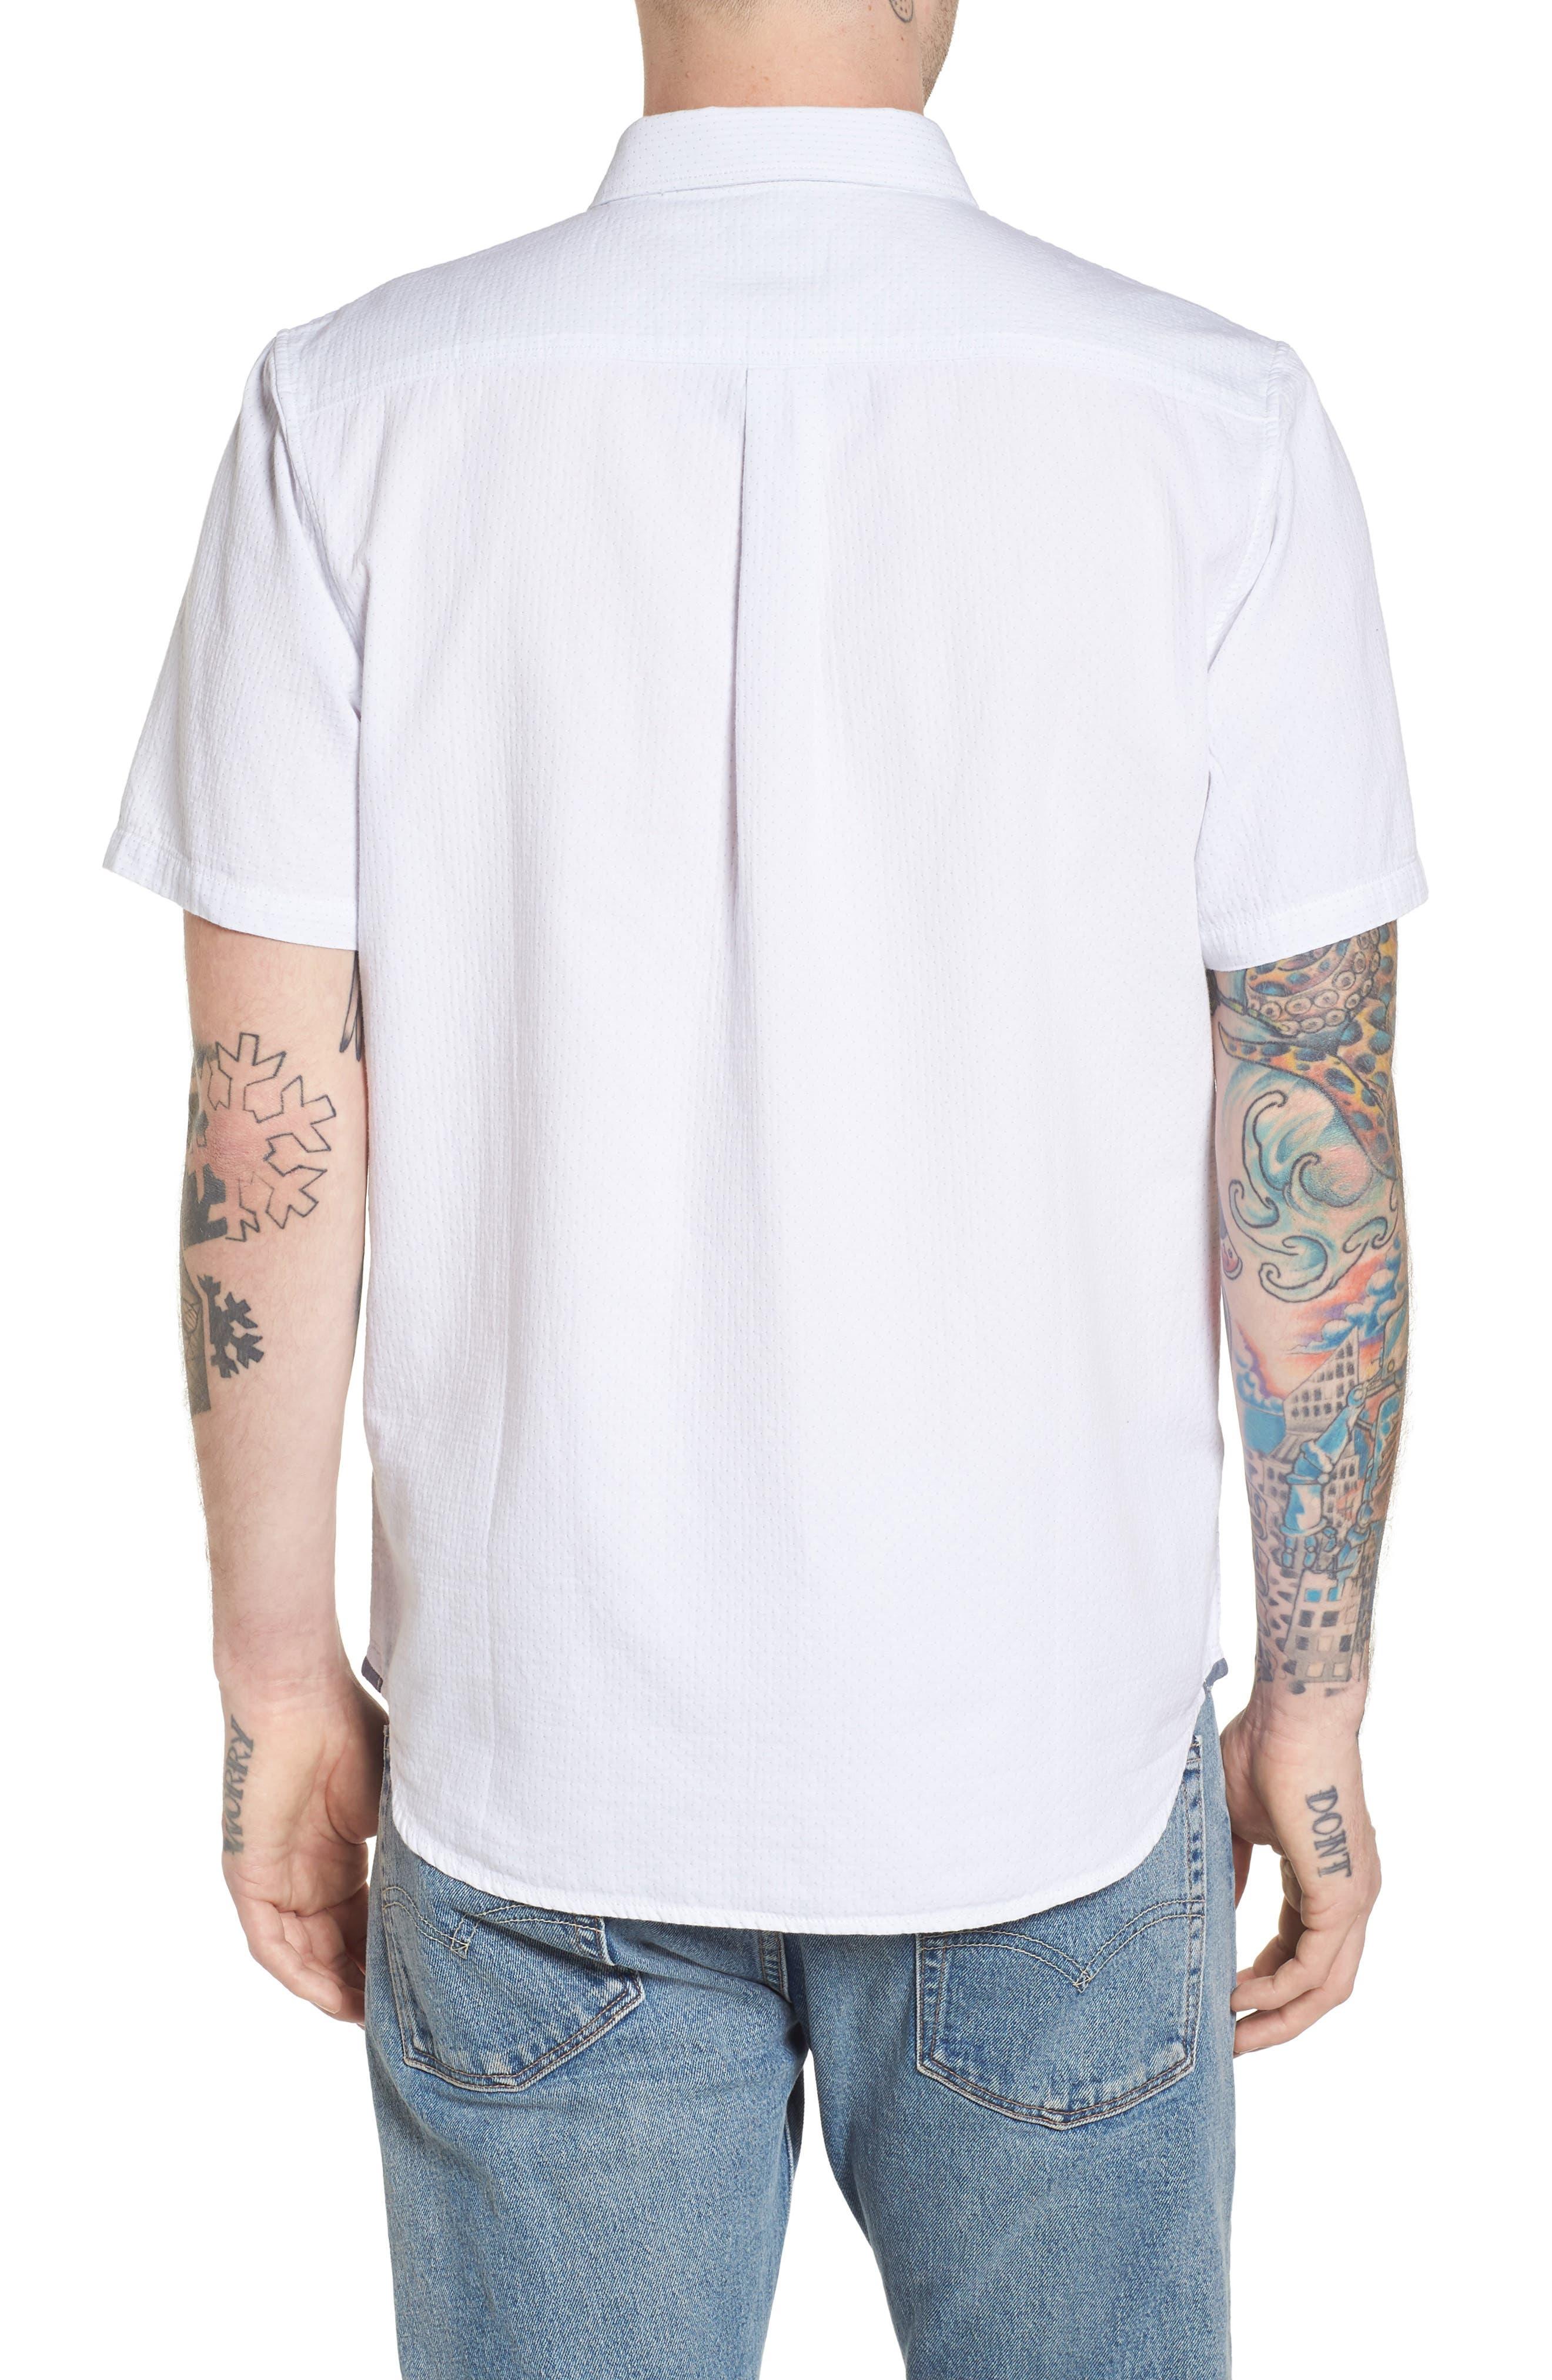 Fairdale Woven Shirt,                             Alternate thumbnail 2, color,